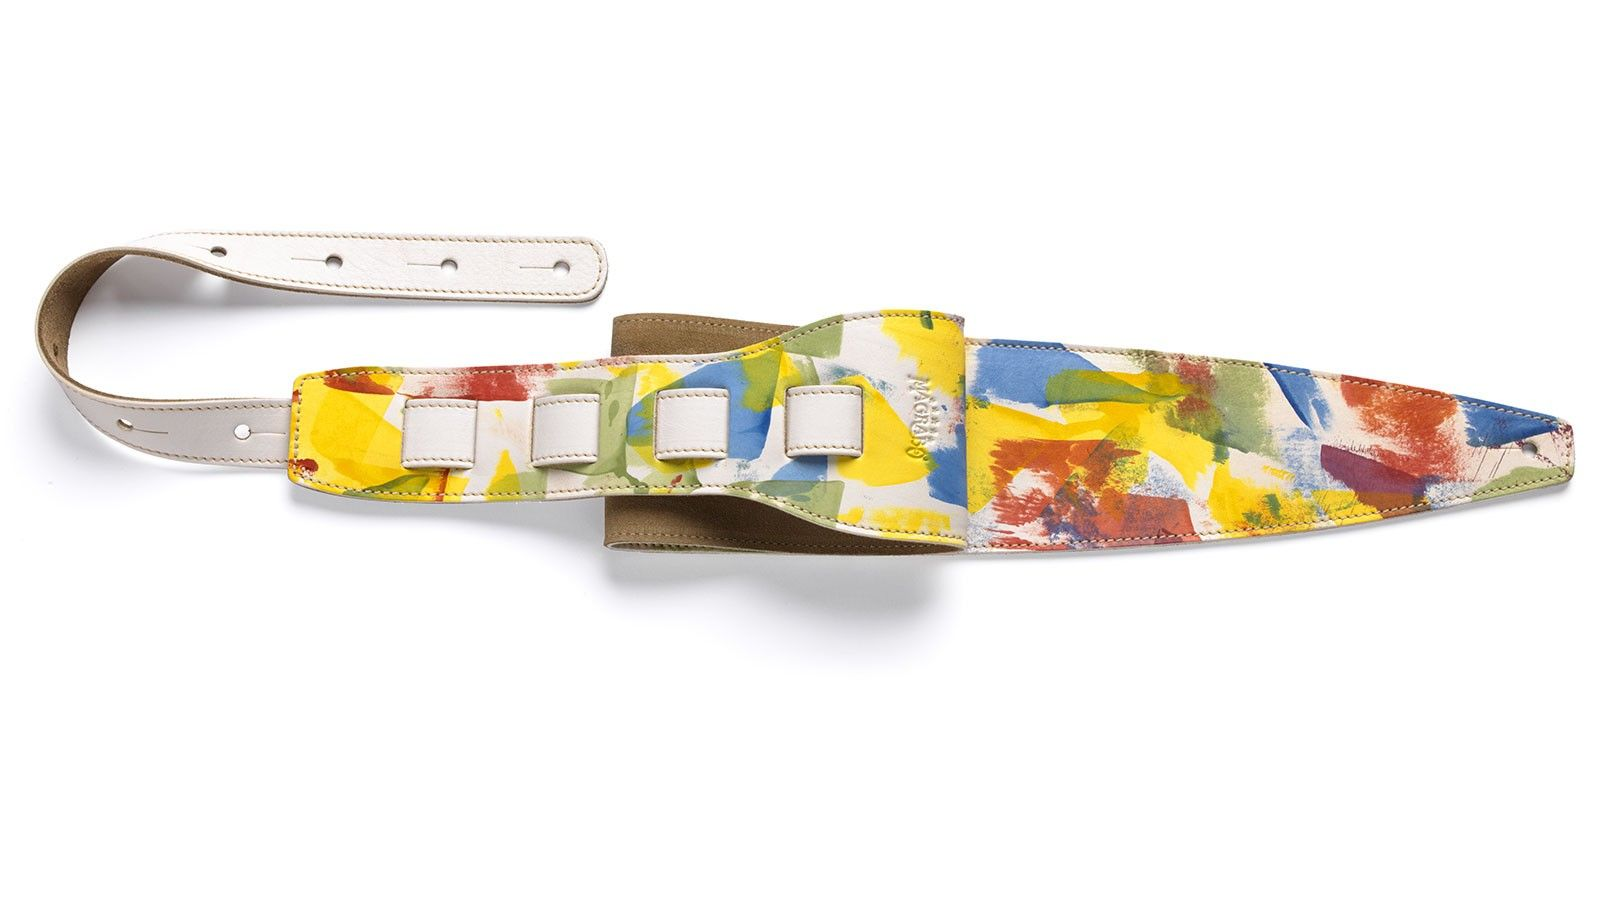 Tracolla chitarra Paint Spatolato Venezia Bianco 10 cm